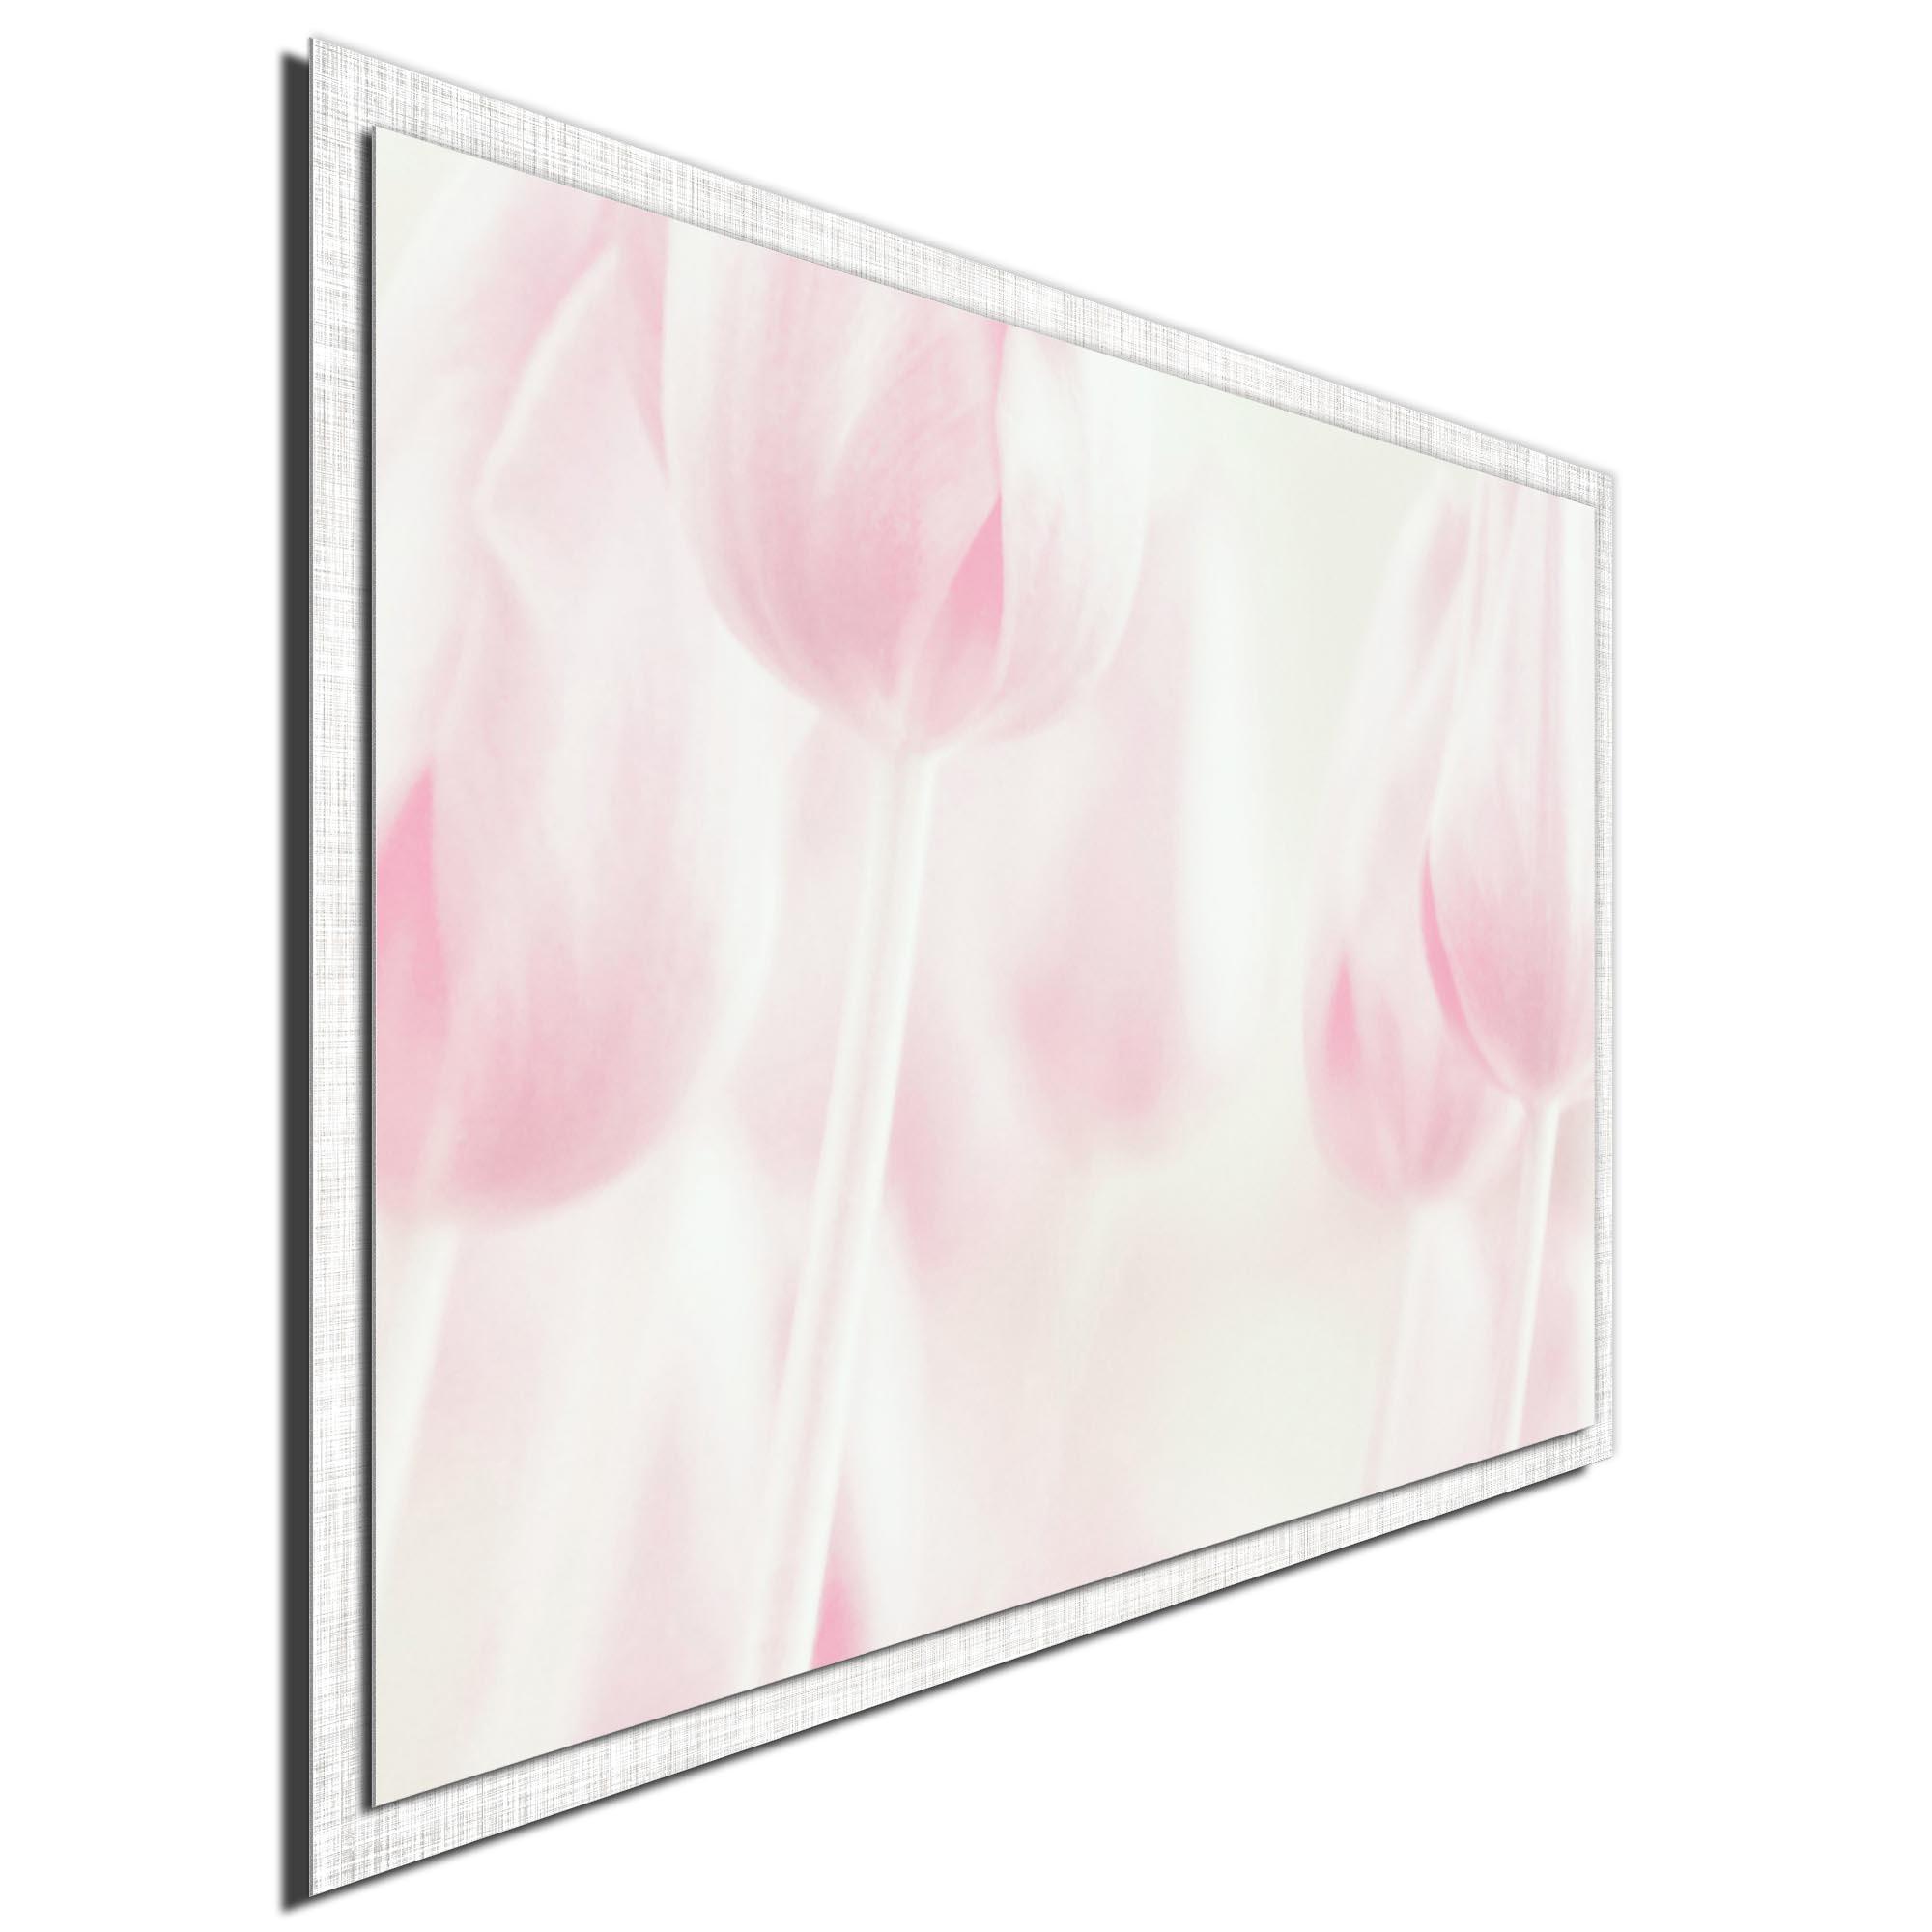 Softness by Delphine Devos - Modern Farmhouse Floral on Metal - Image 2